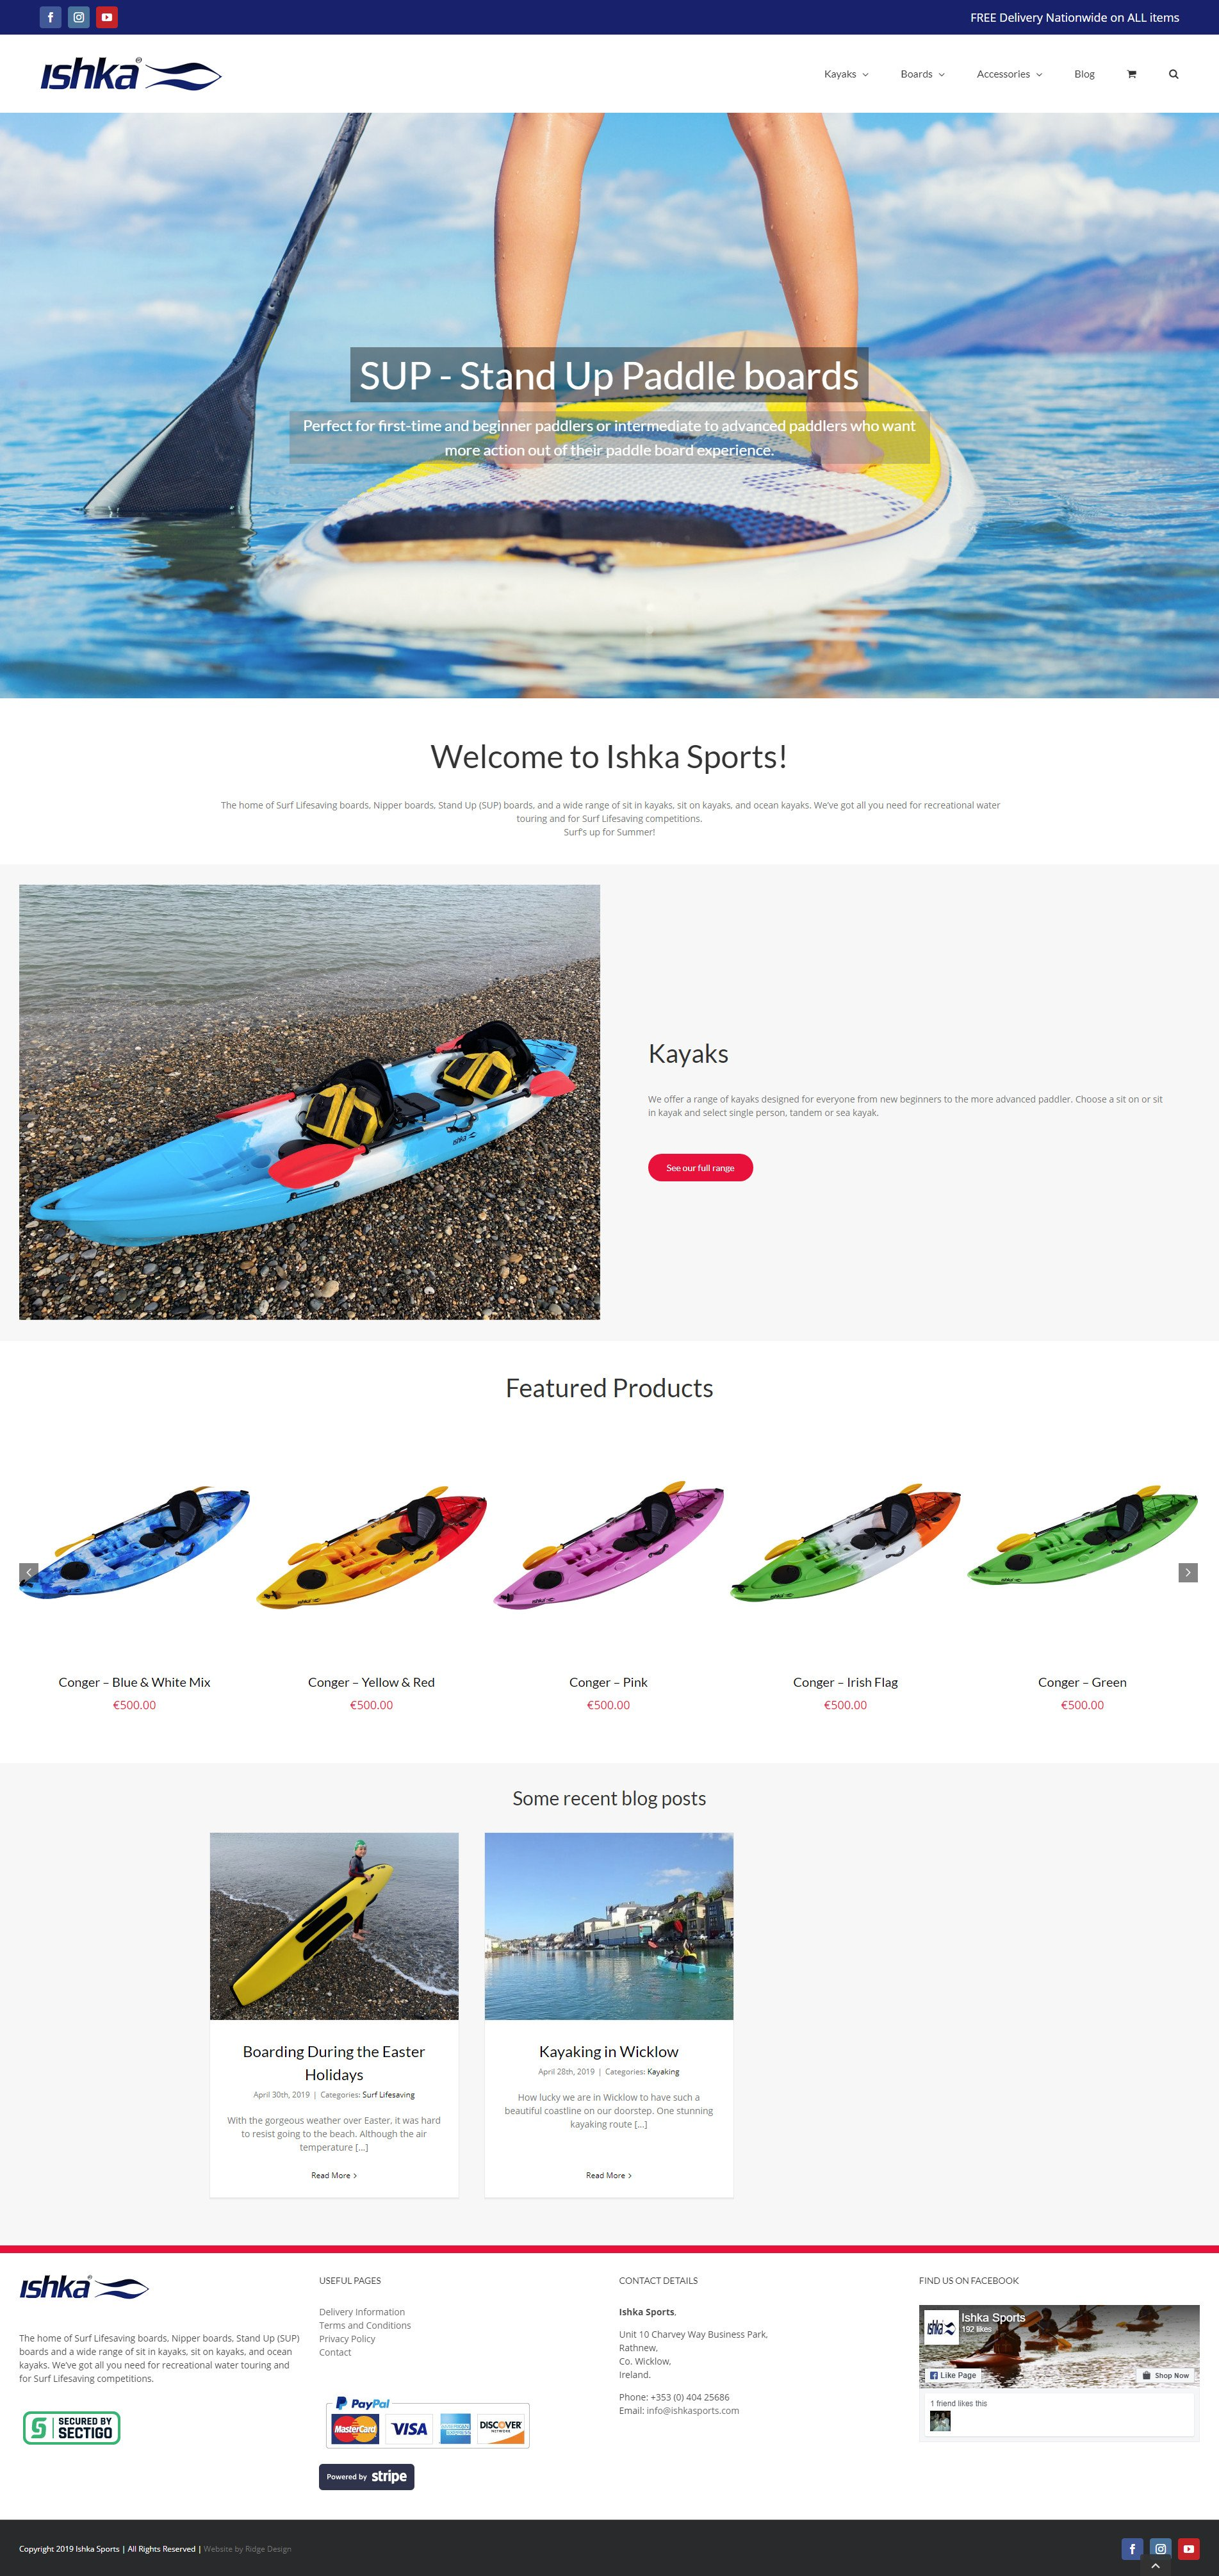 Ishka-Sports-Website-Design-home